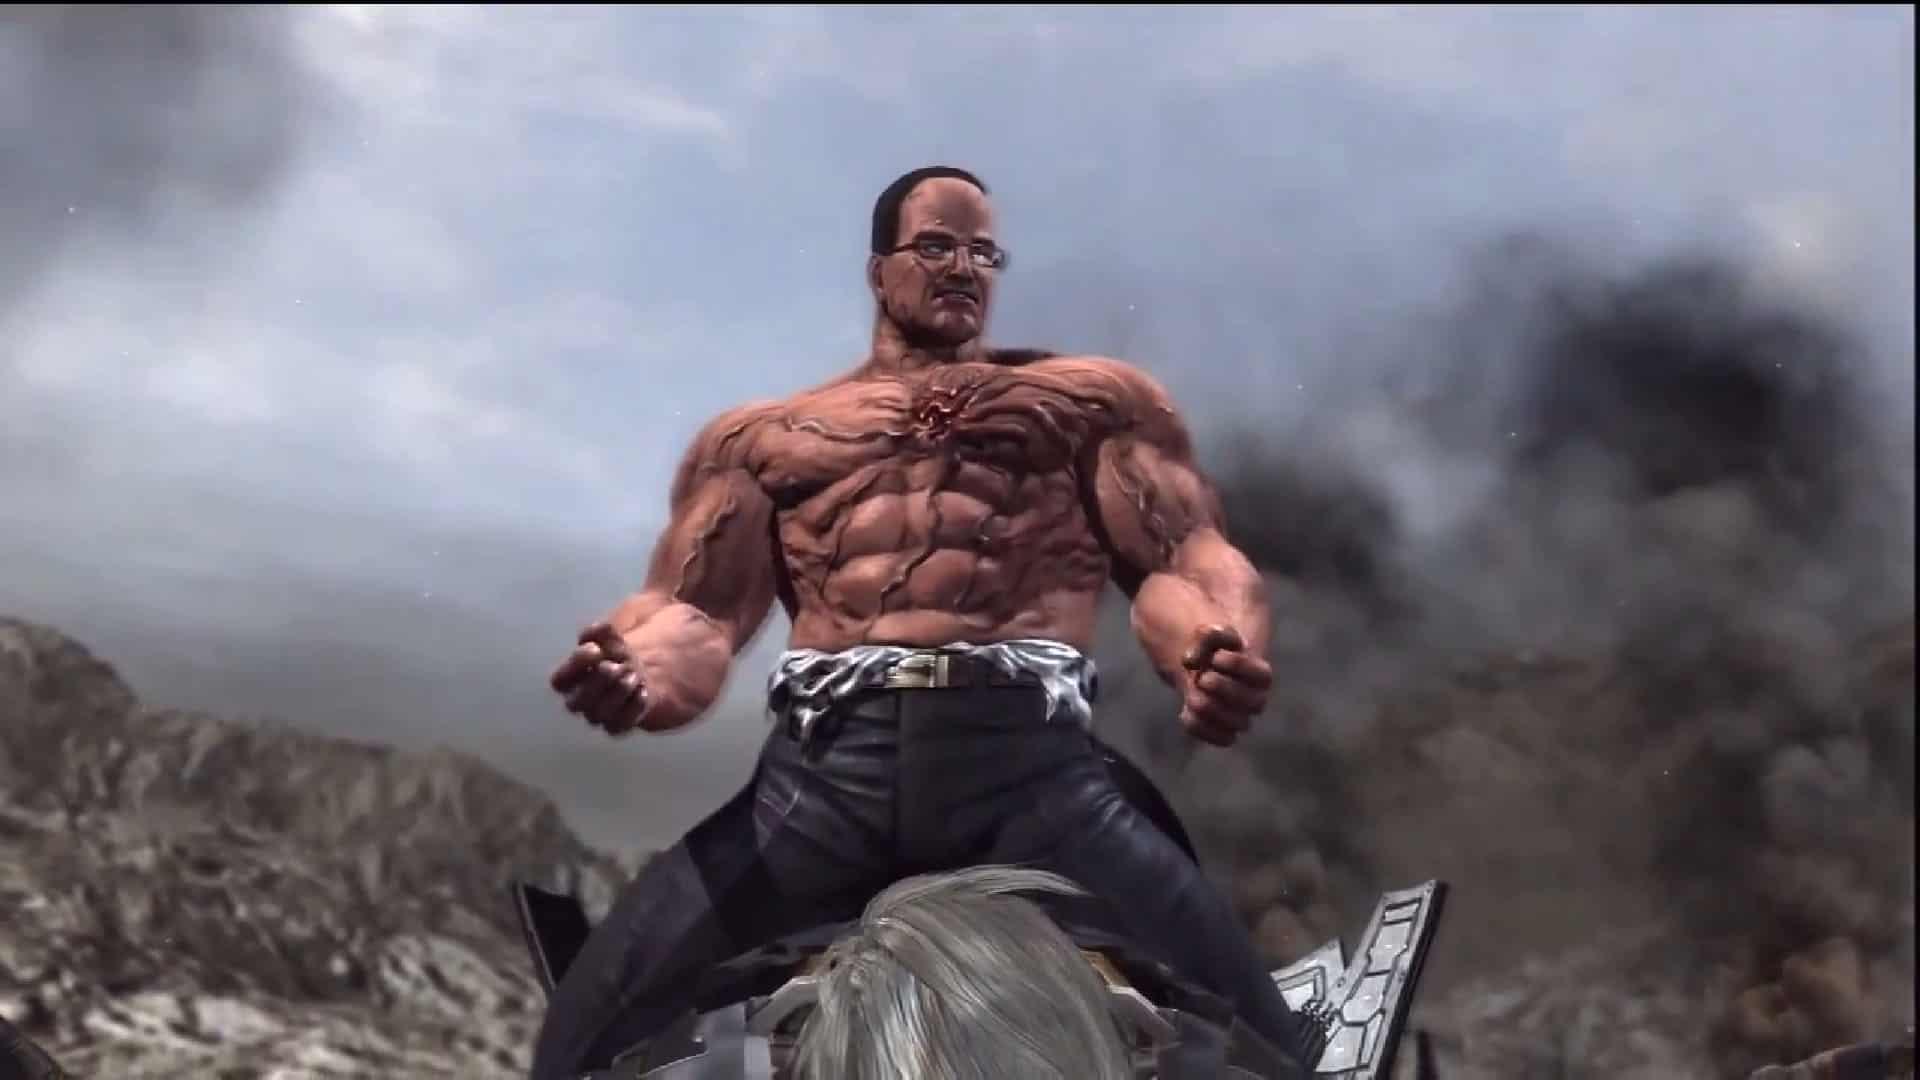 Toughest Video Game Bosses - Senator Armstrong - Metal Gear Rising- Revengeance